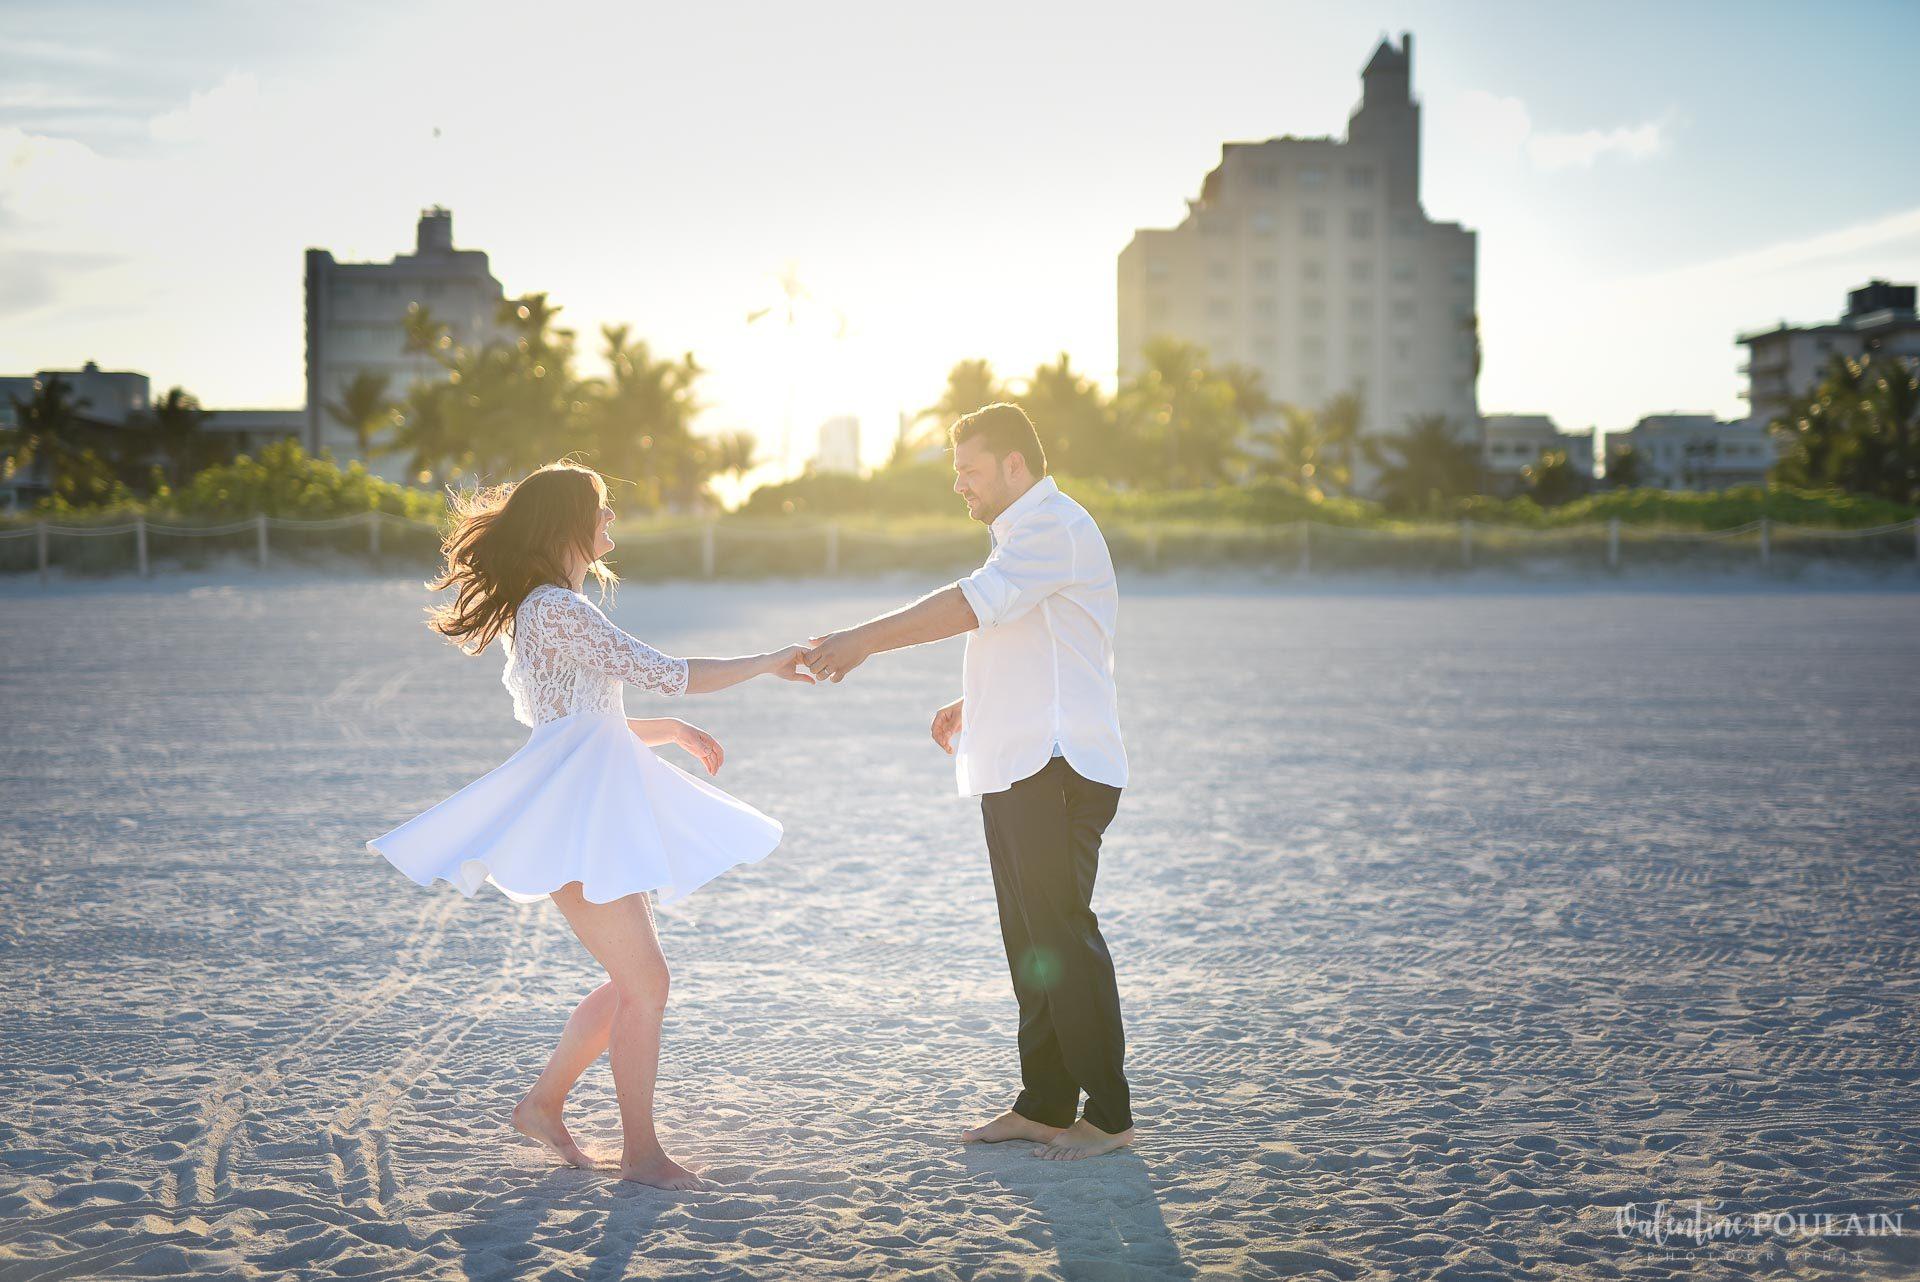 Day after Miami - Valentine Poulain valse